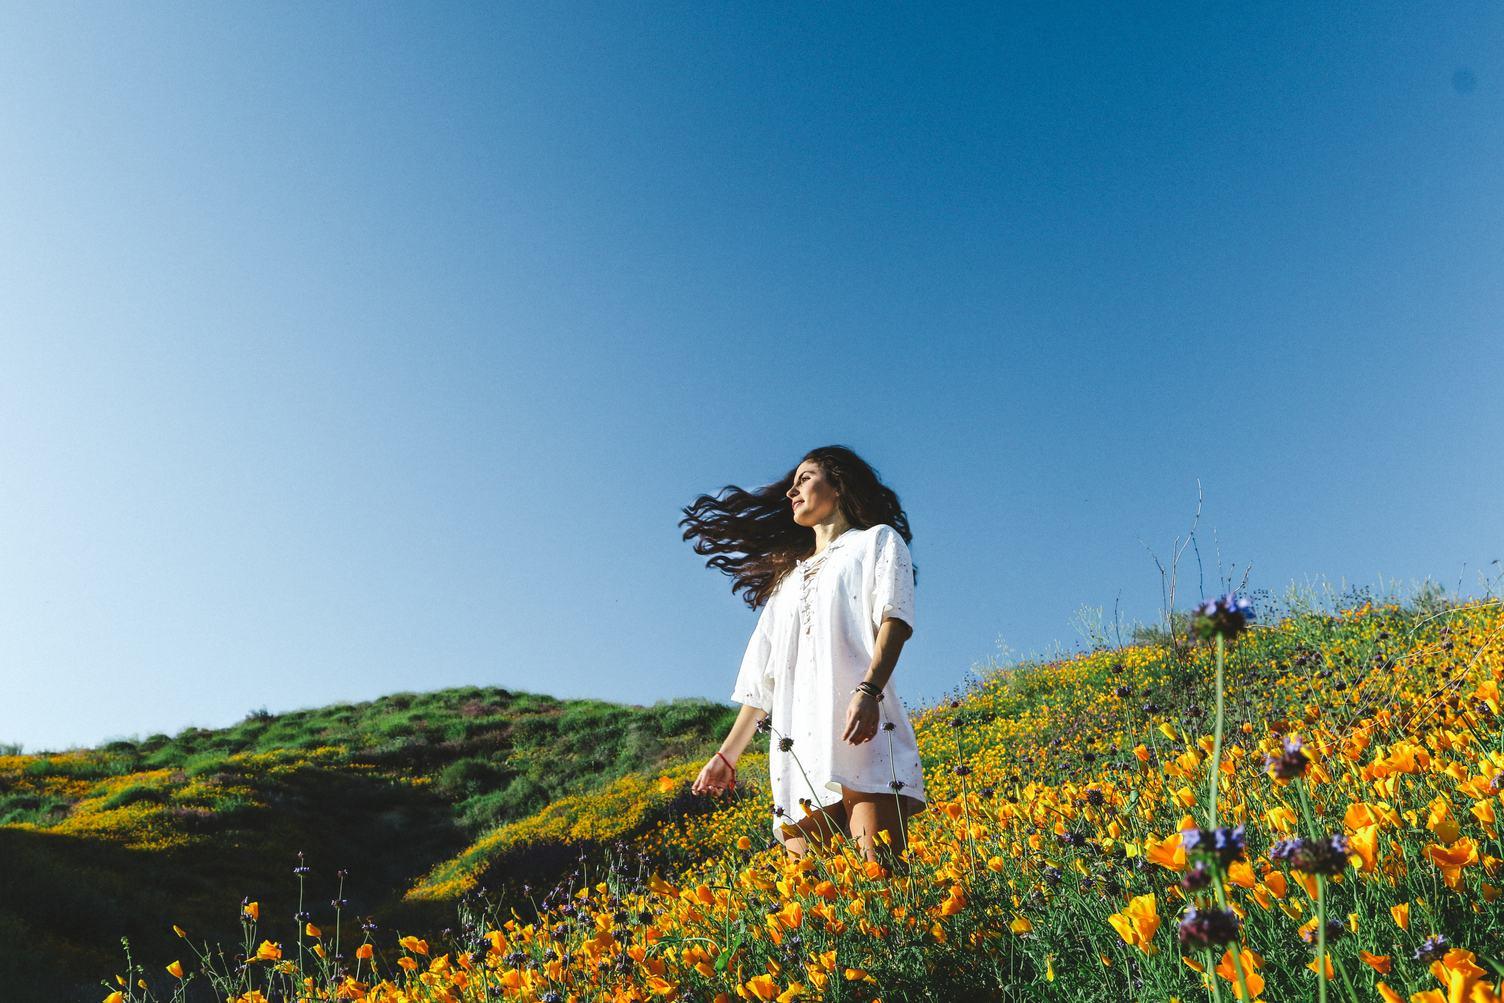 Woman at Blooming Orange Poppy Field